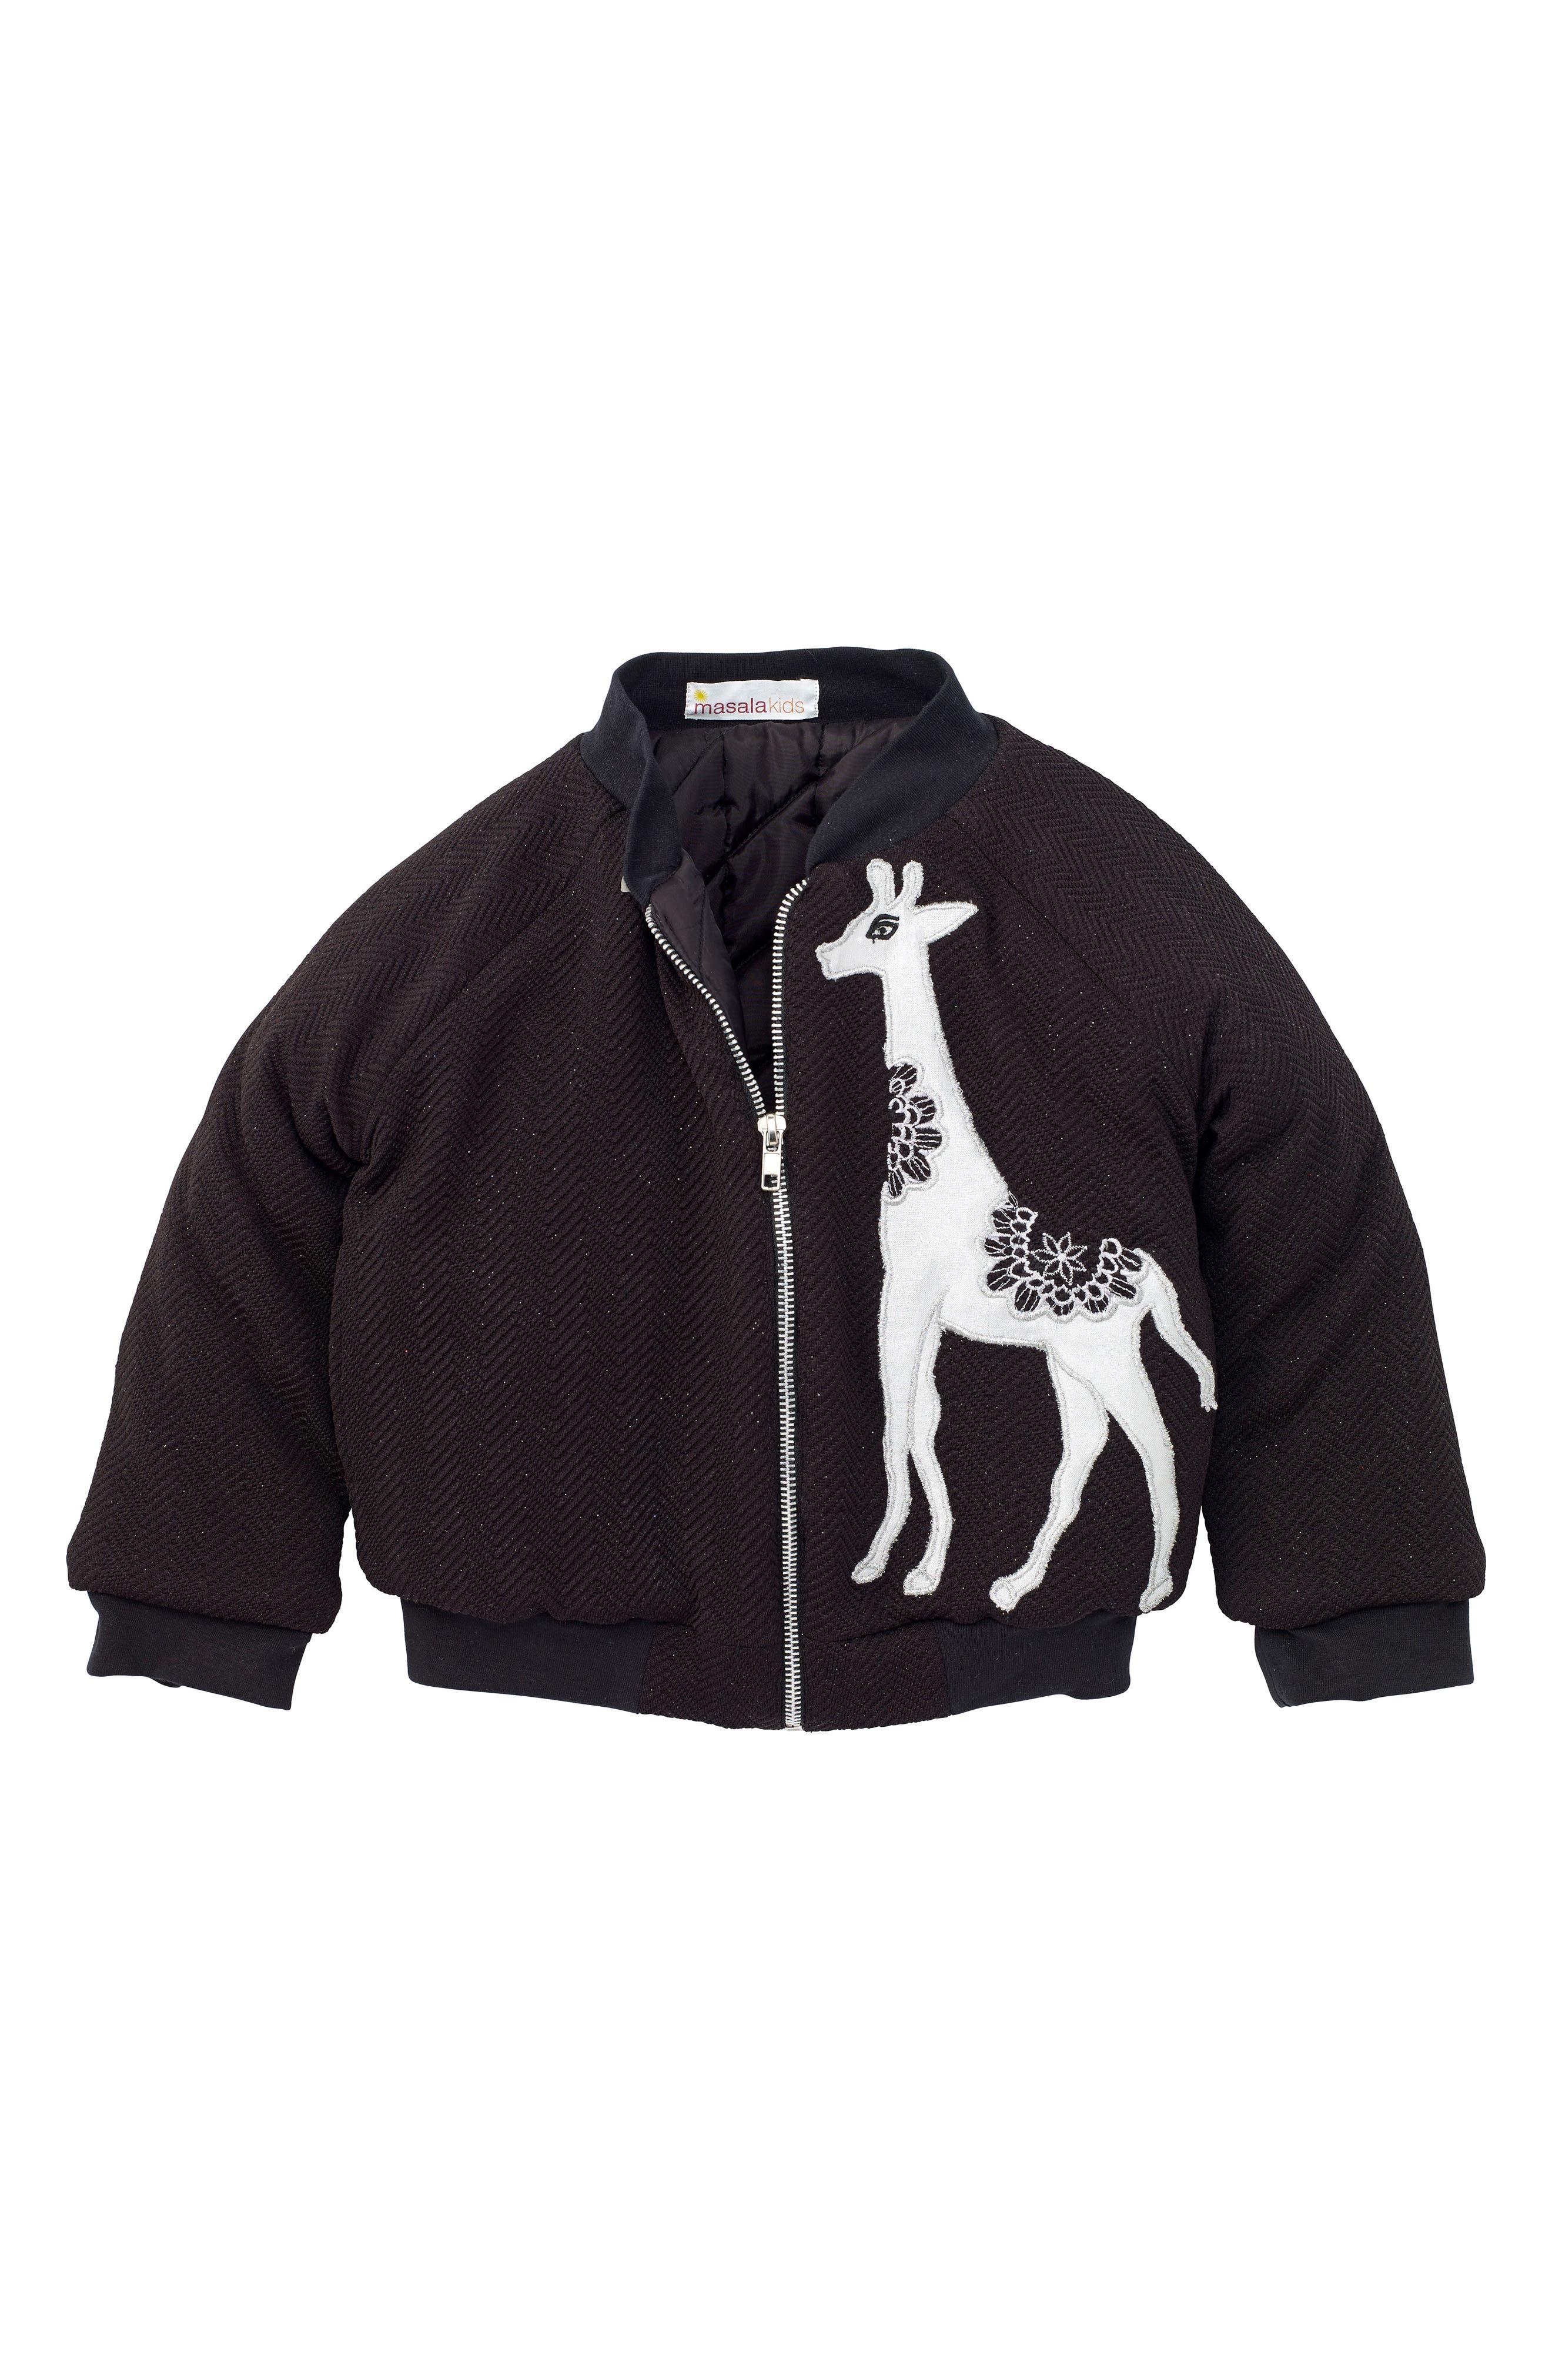 Gia Bomber Jacket,                         Main,                         color, Black